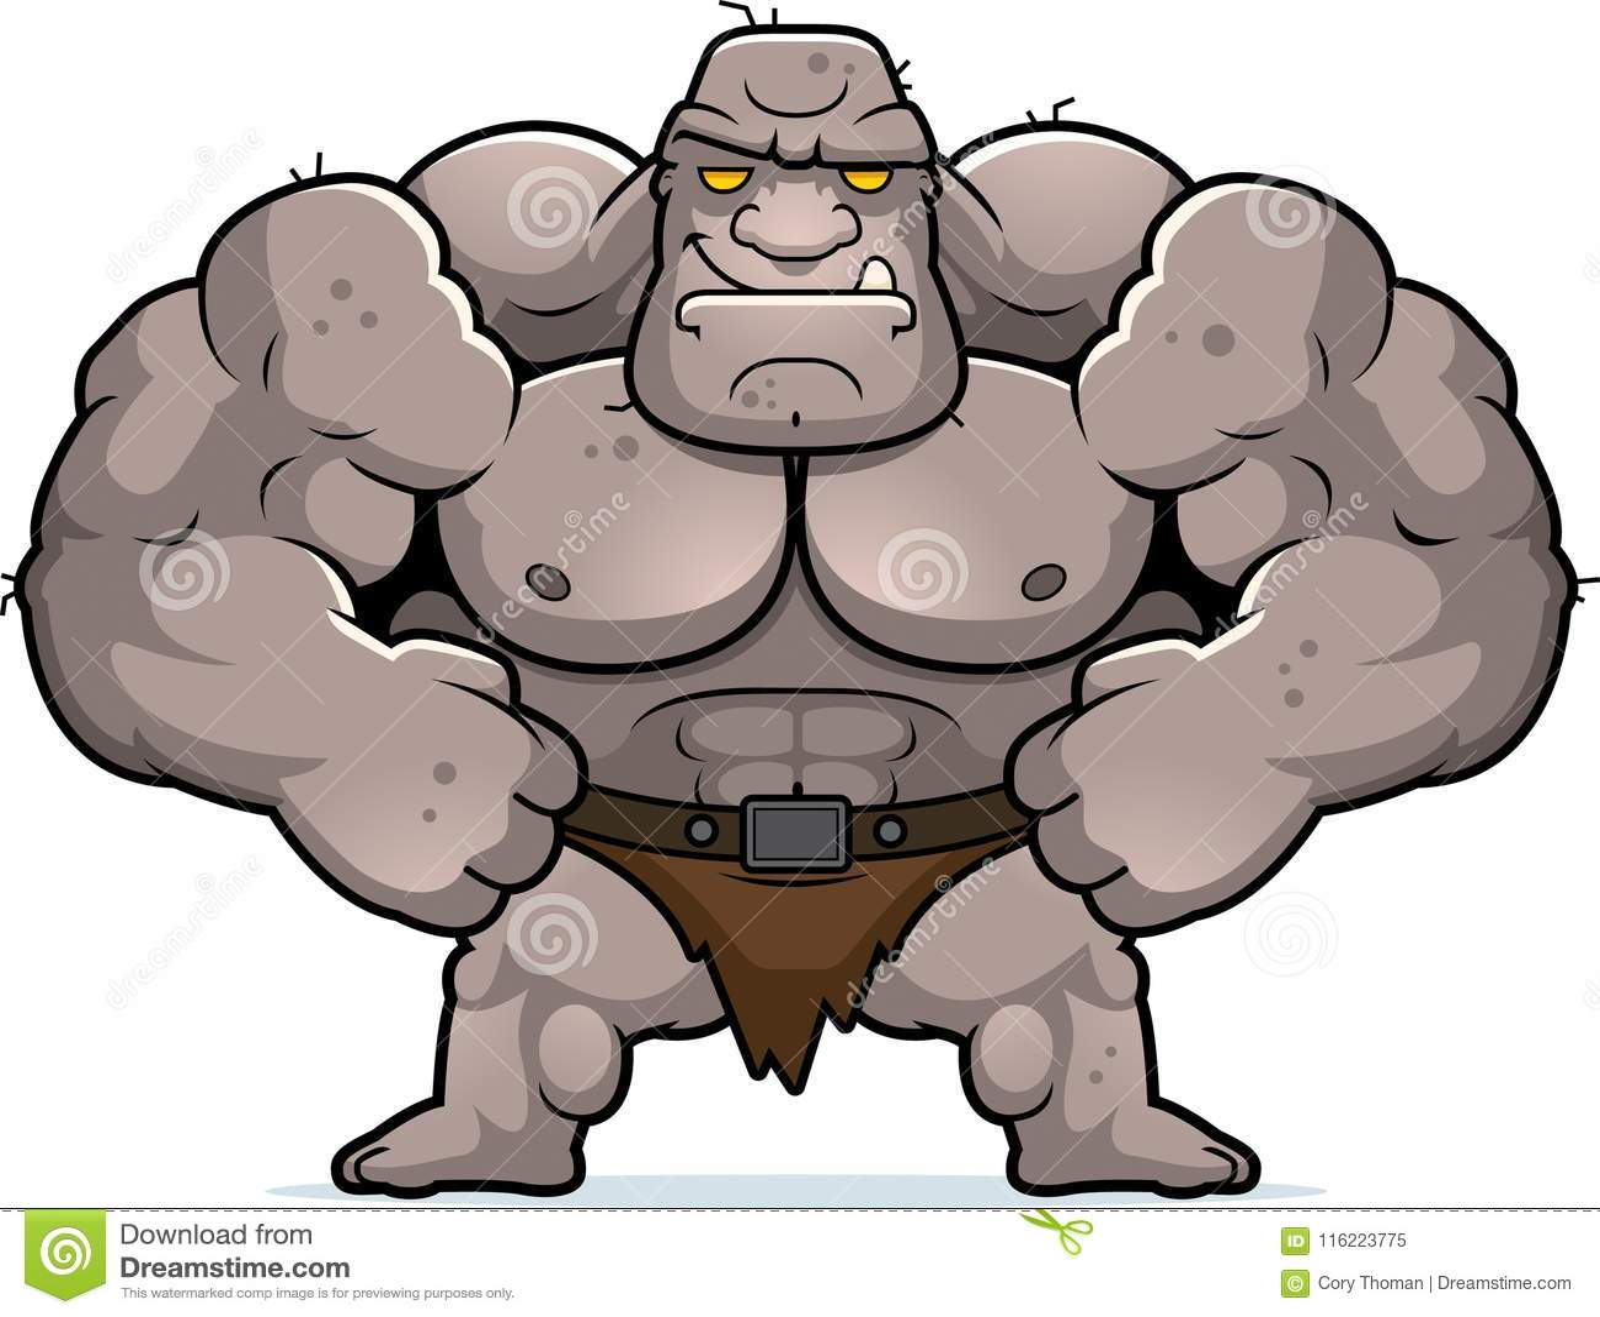 Cartoon Ogre Confident